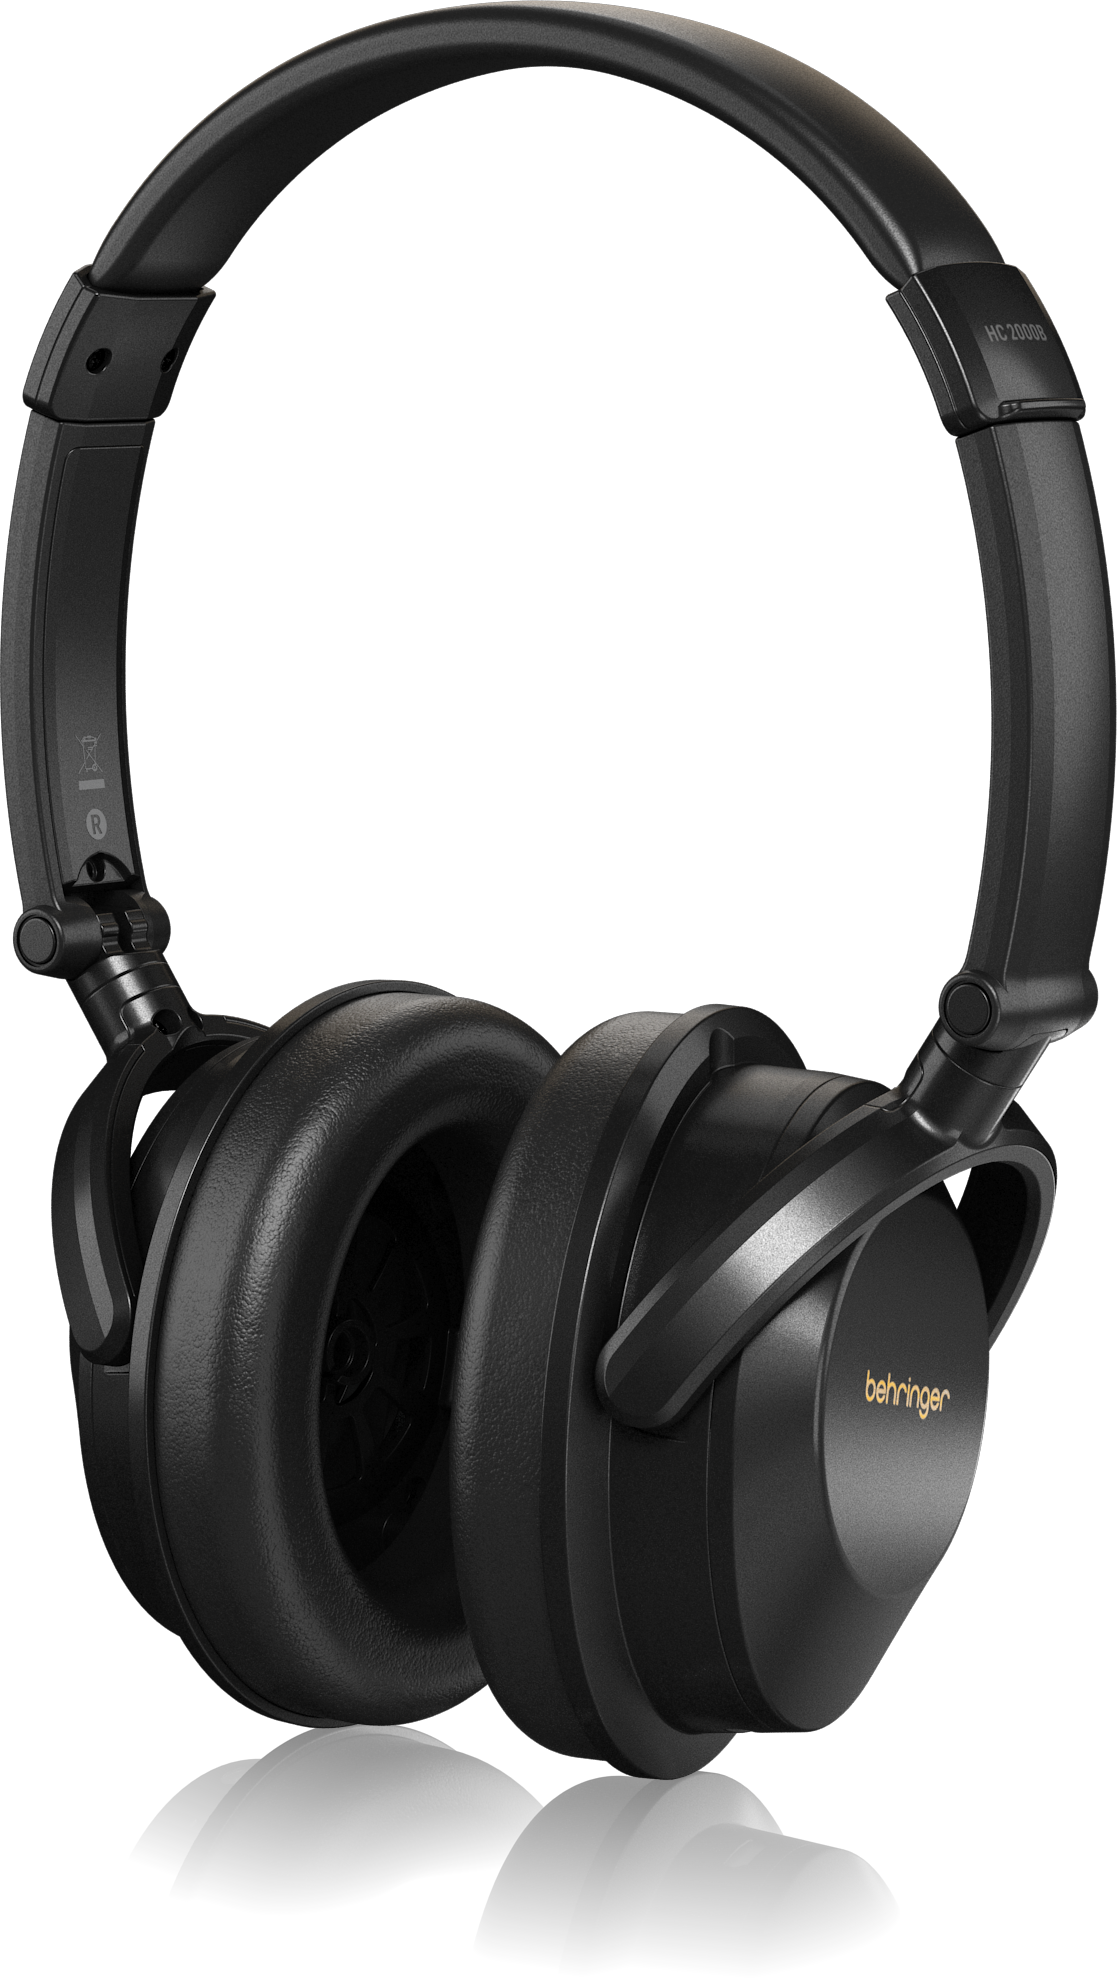 Behringer HC 2000B - Wireless Headphone